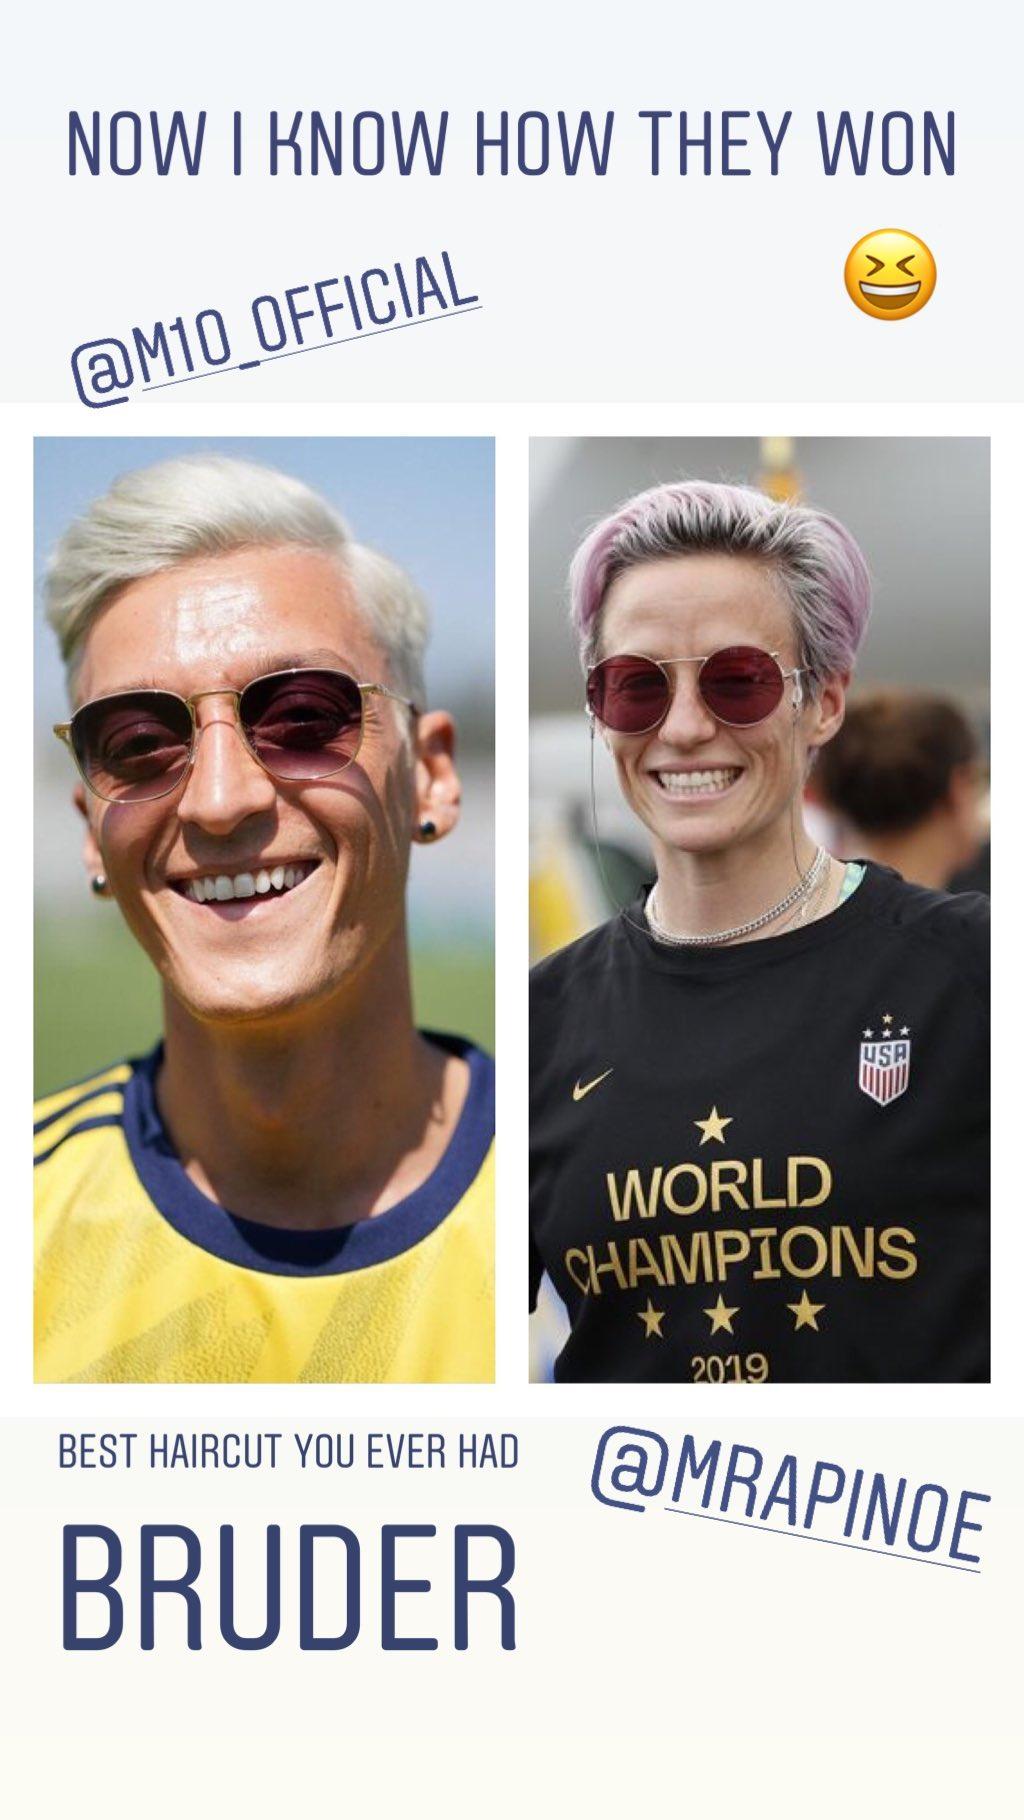 WTF - Arsenal : Quand Aubemayang compare Mesut Özil à Megan Rapinoe